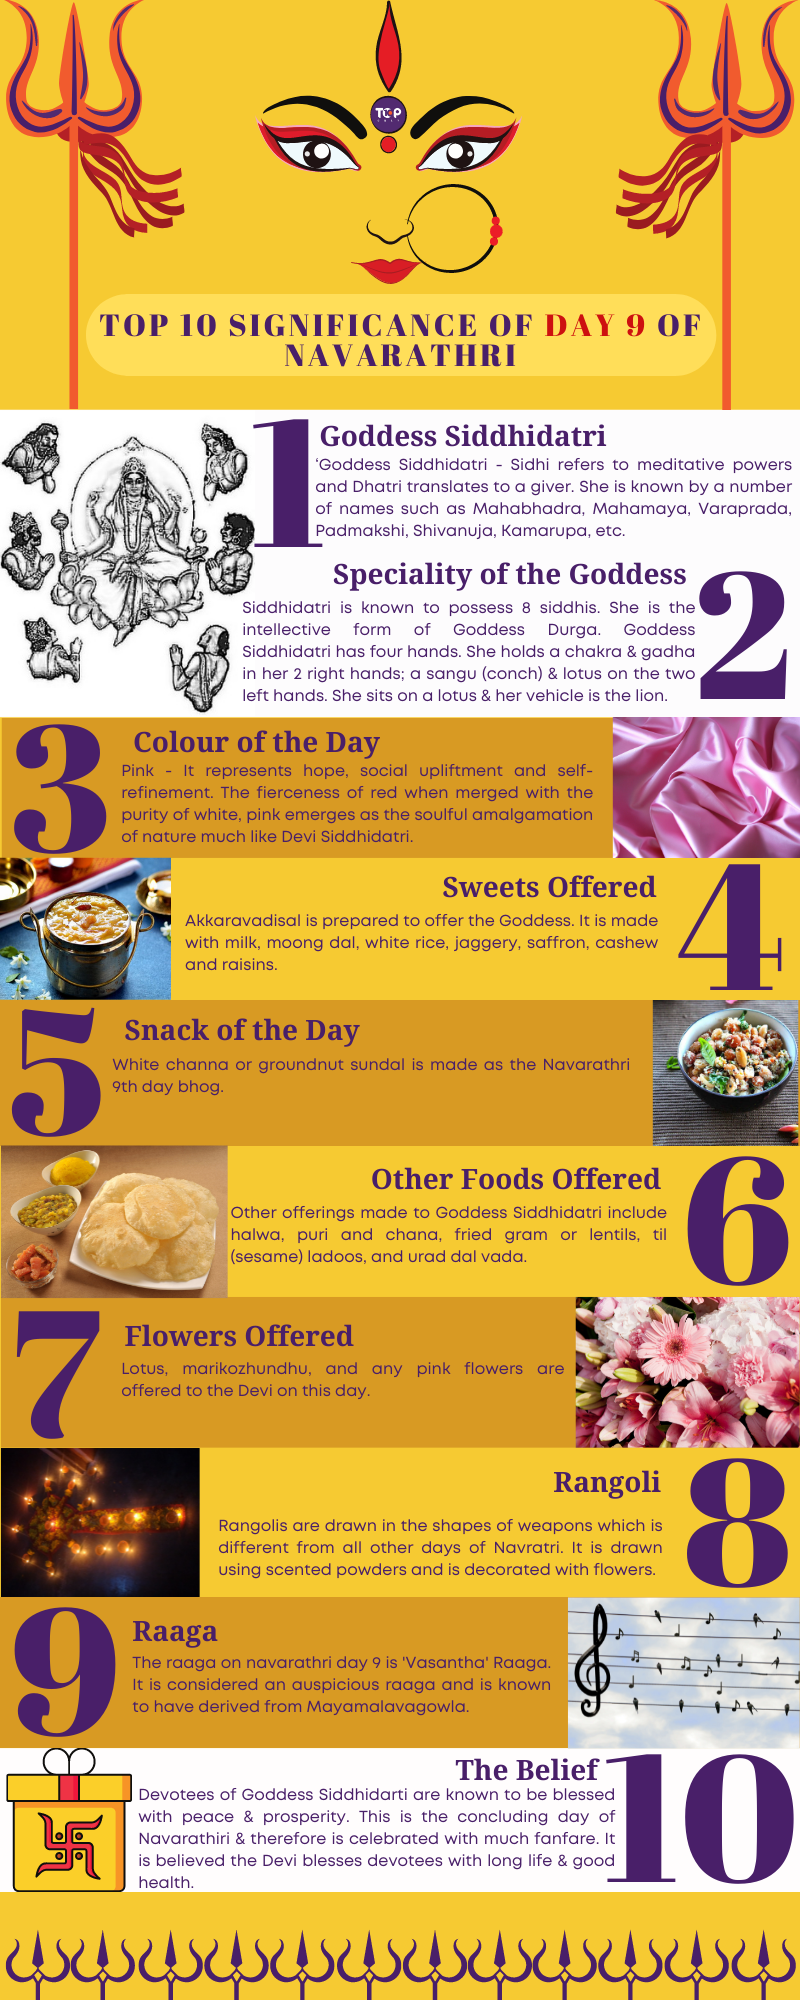 Significance of Day 9 of Navarathri